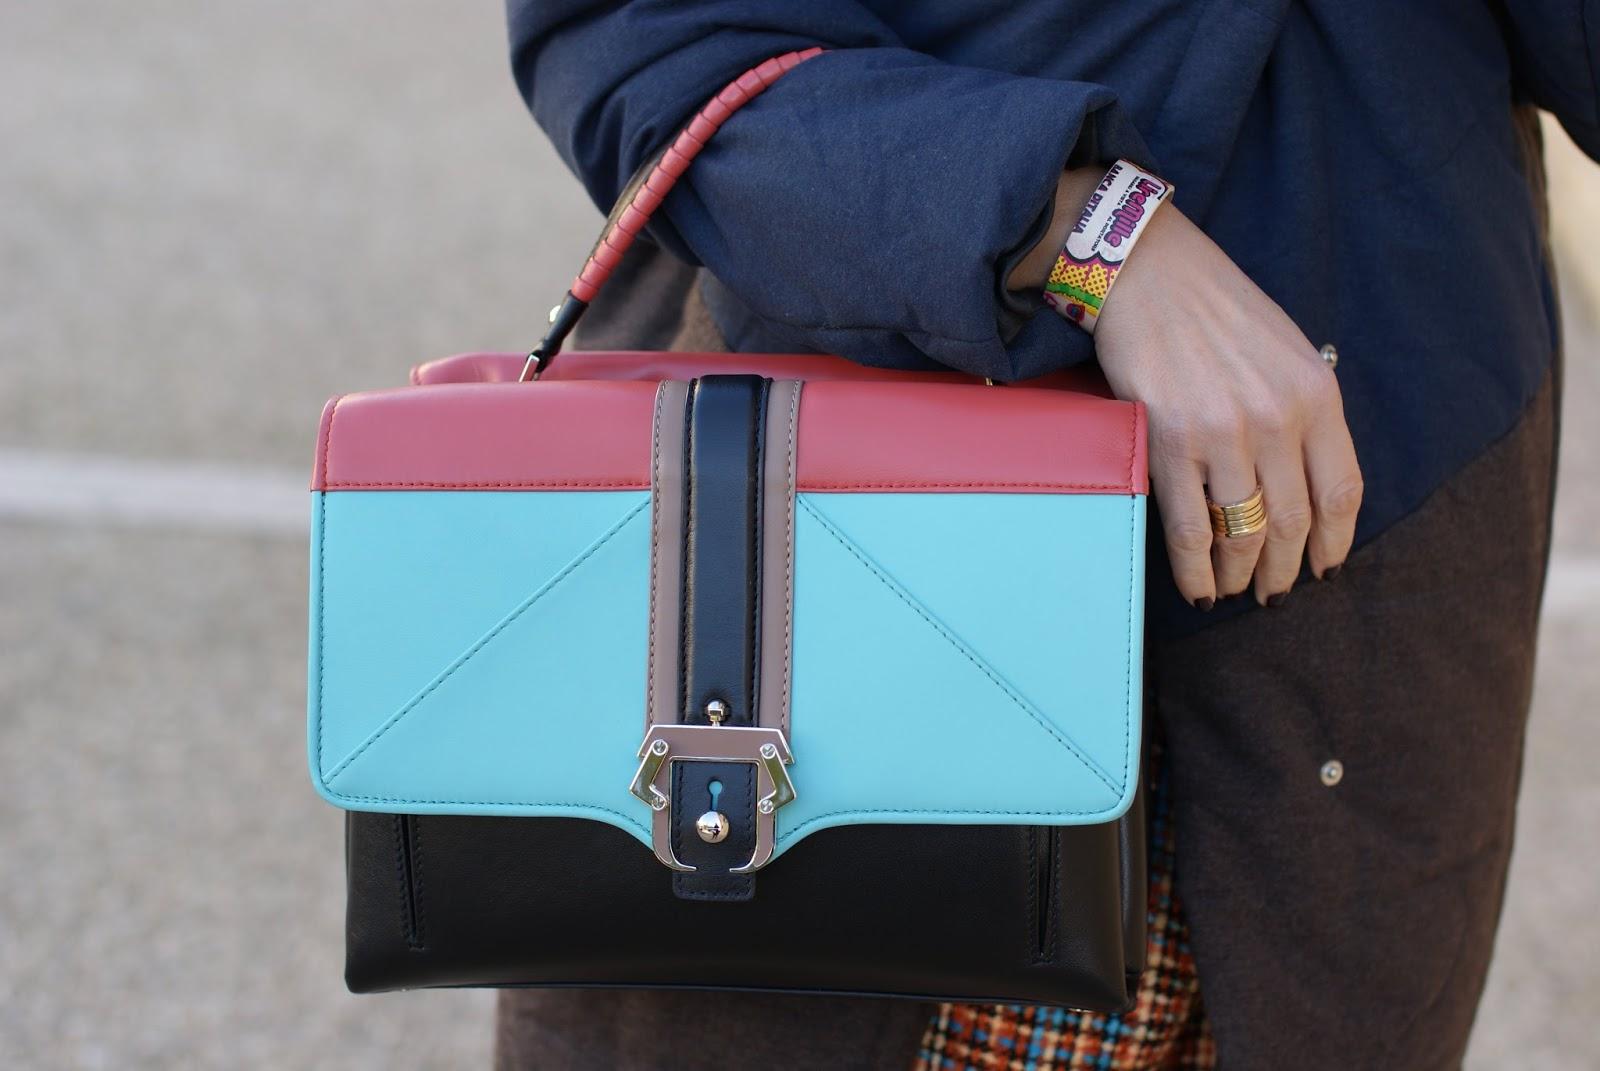 Millelire POP bracelet Paula Cademartori Faye bag on Fashion and Cookies fashion blog, fashion blogger style